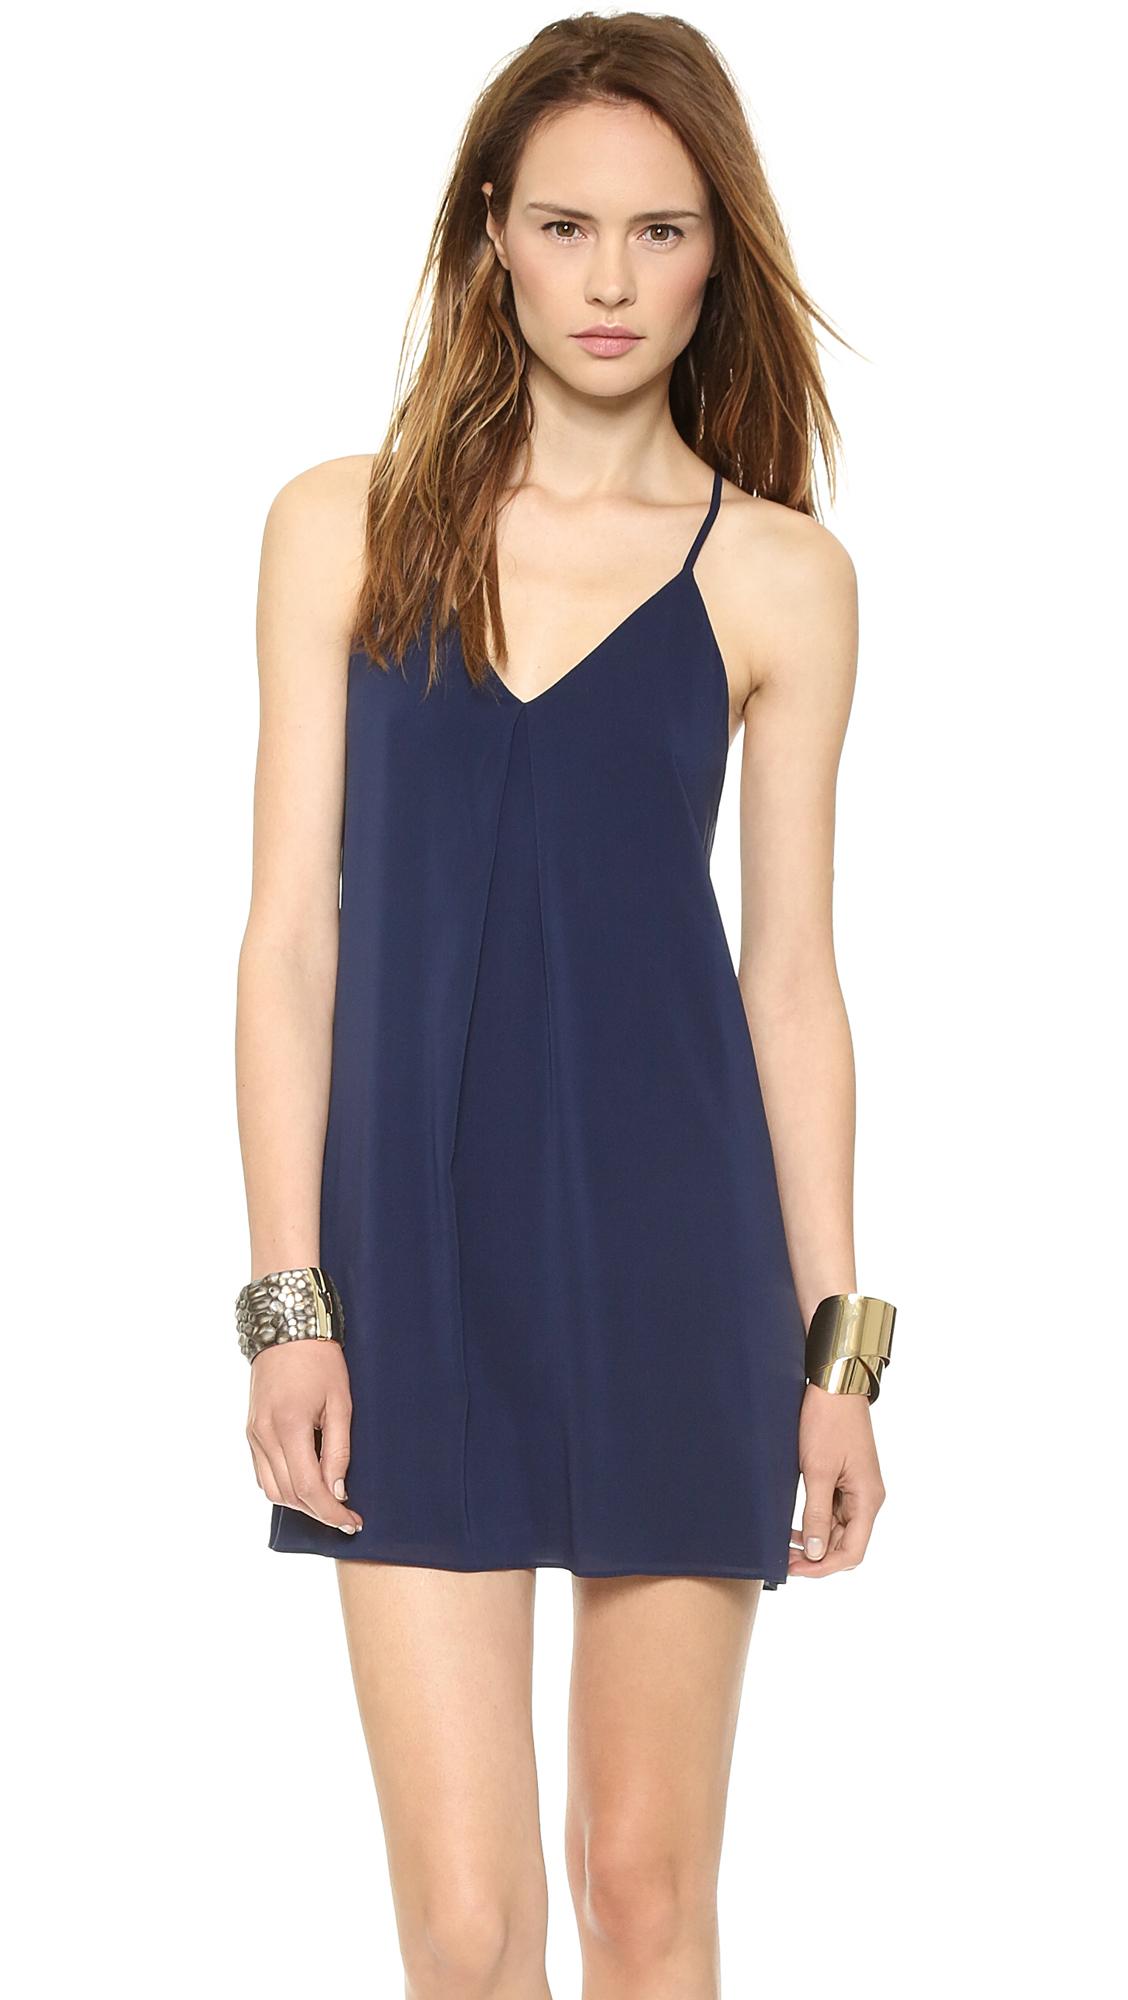 Alice + Olivia Fierra Dress - Navy at Shopbop